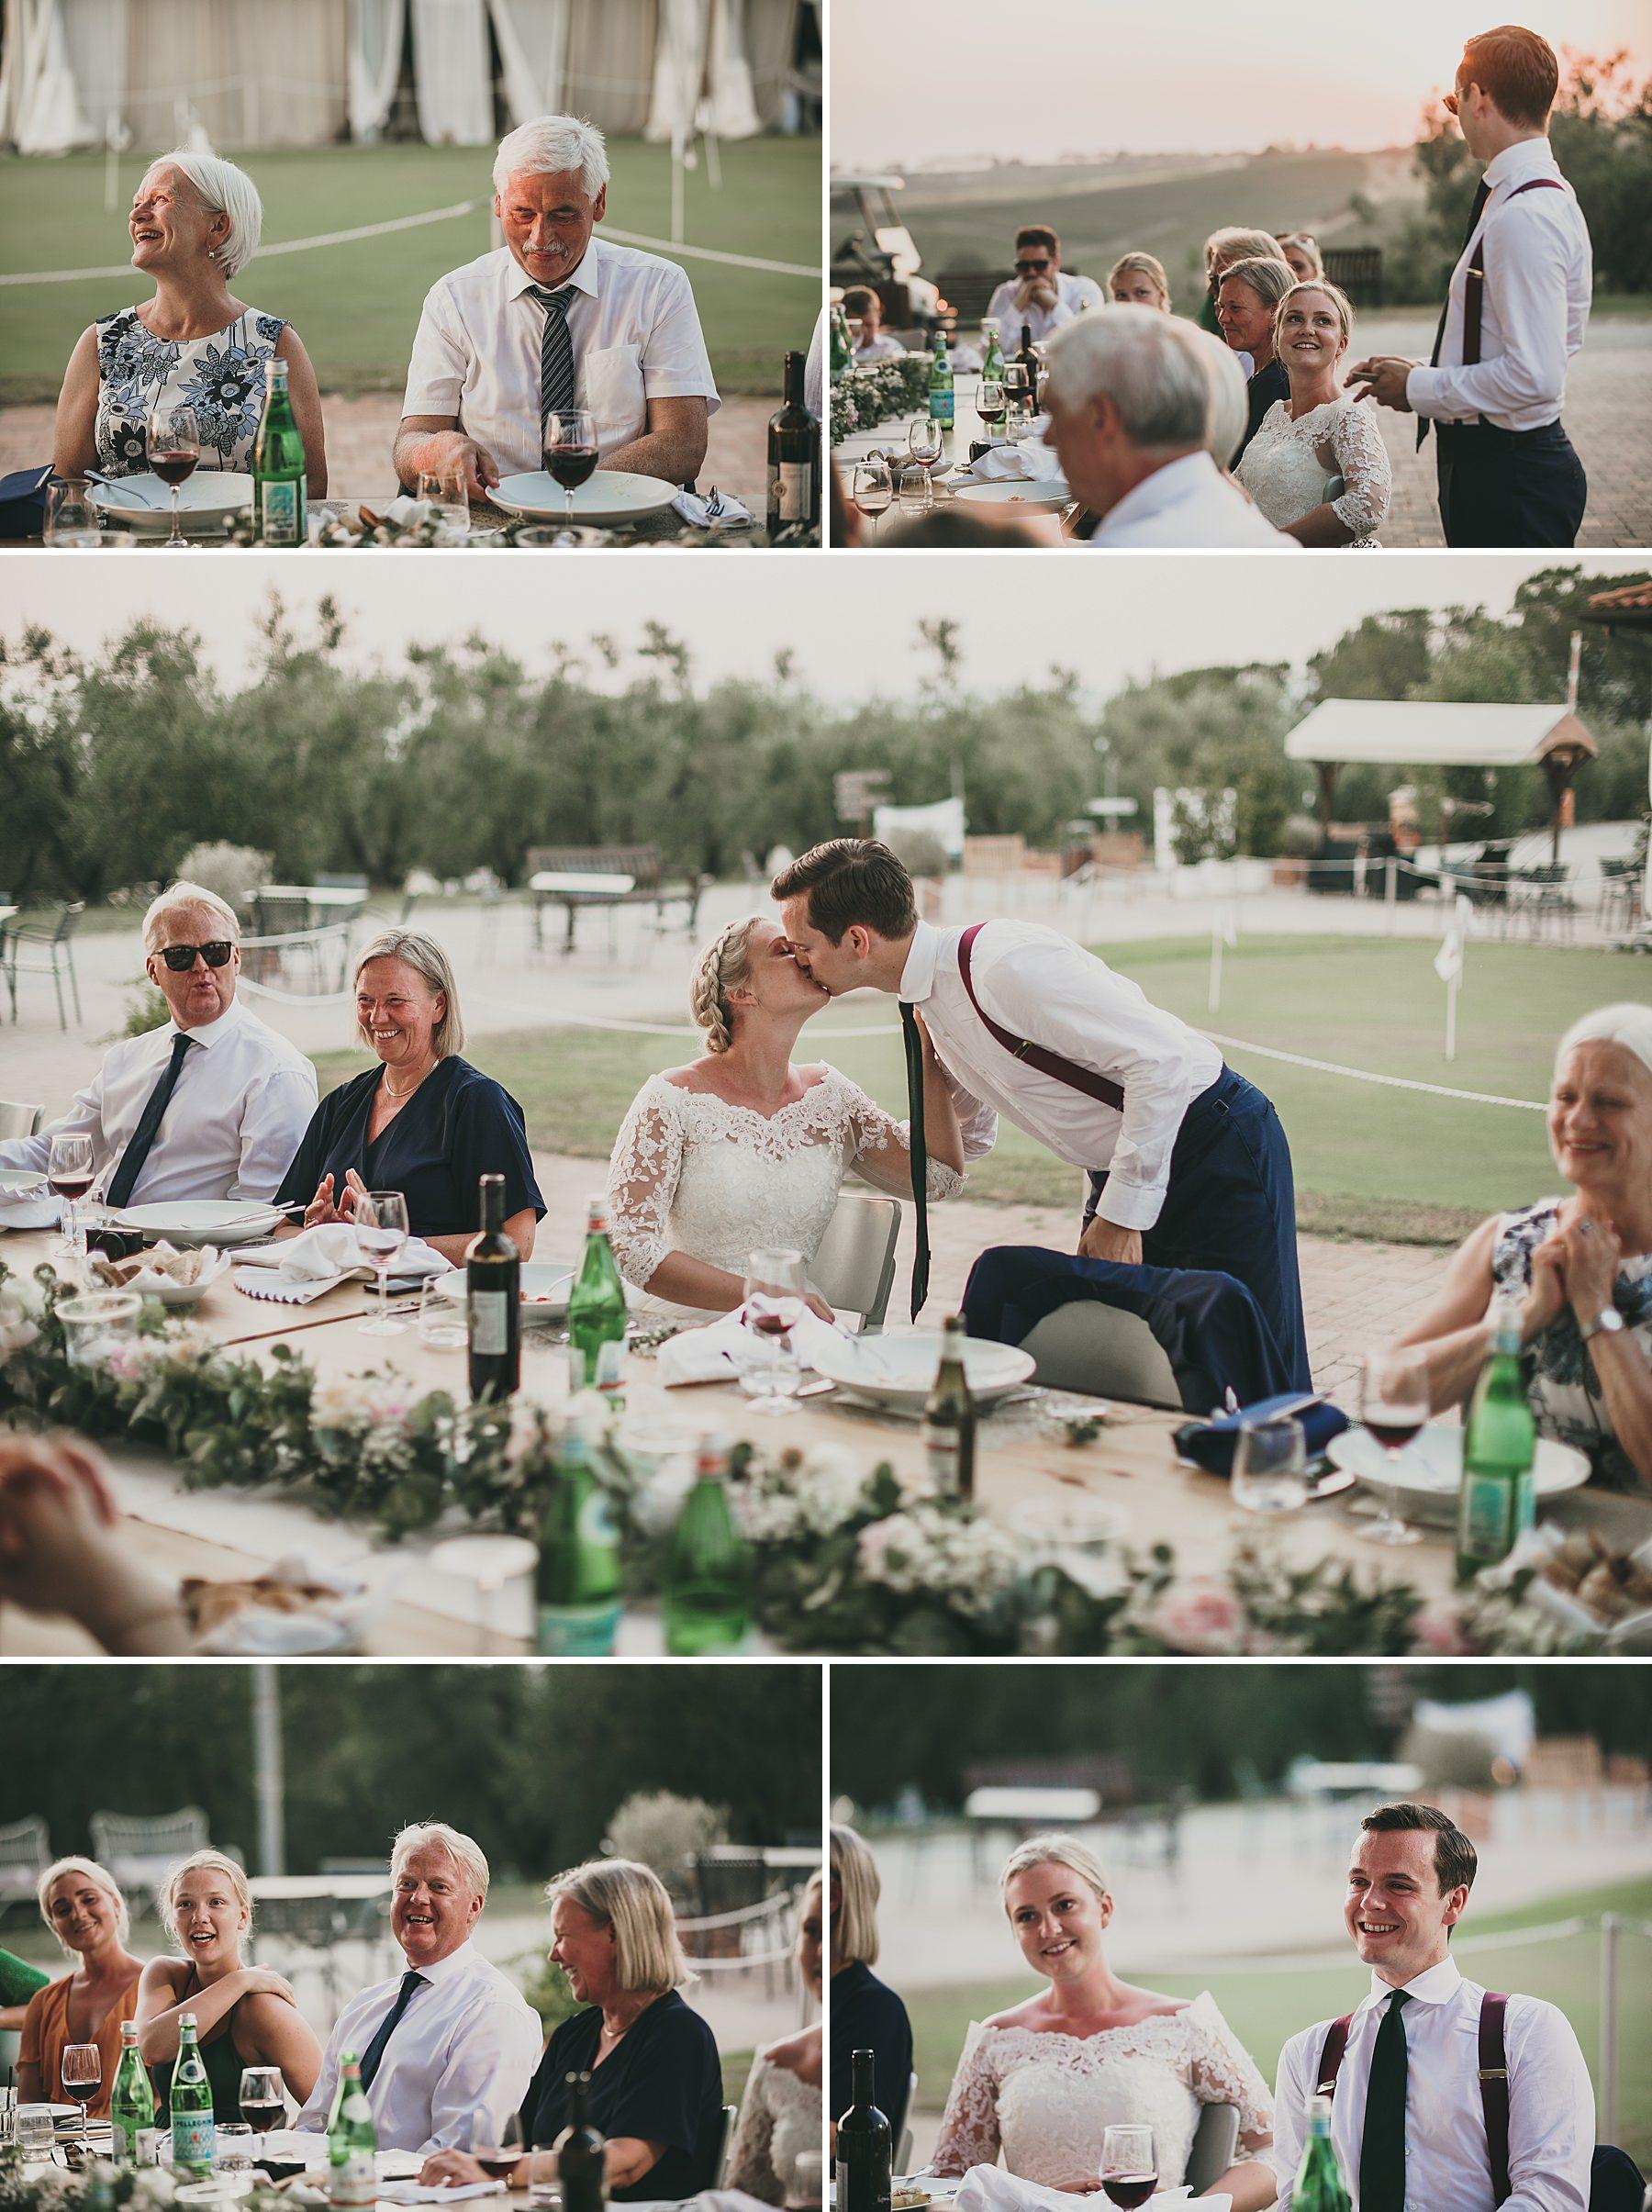 Cena di matrimonio a Bellosguardo Vinci